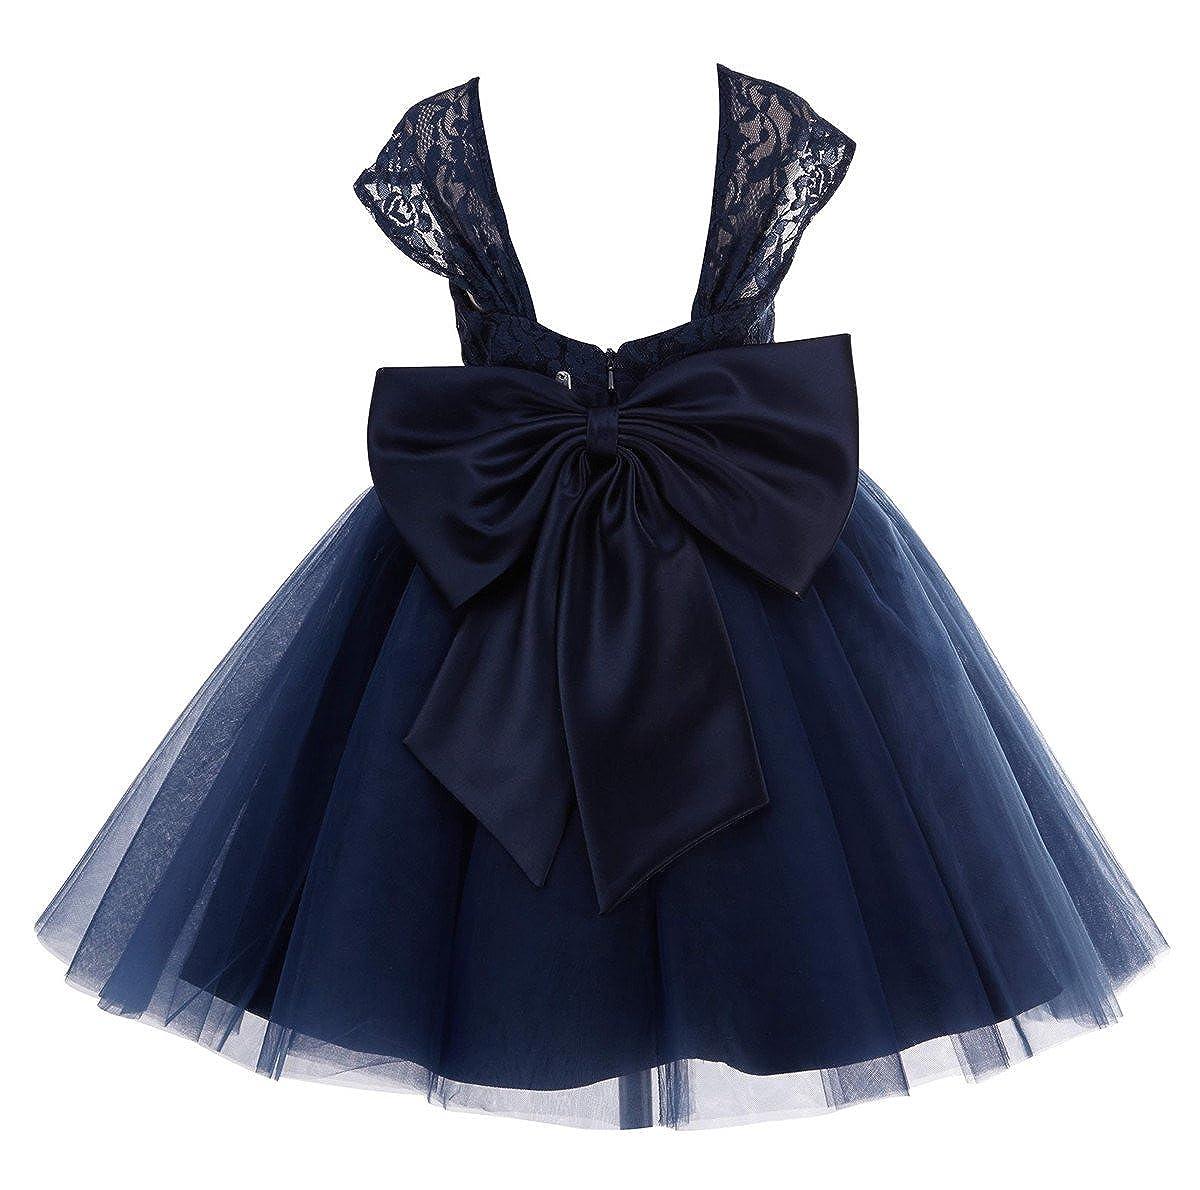 69e3ac2919a Amazon.com  princhar Lace Tulle Flower Girl Dress Wedding Party Formal Girl  Dress  Clothing